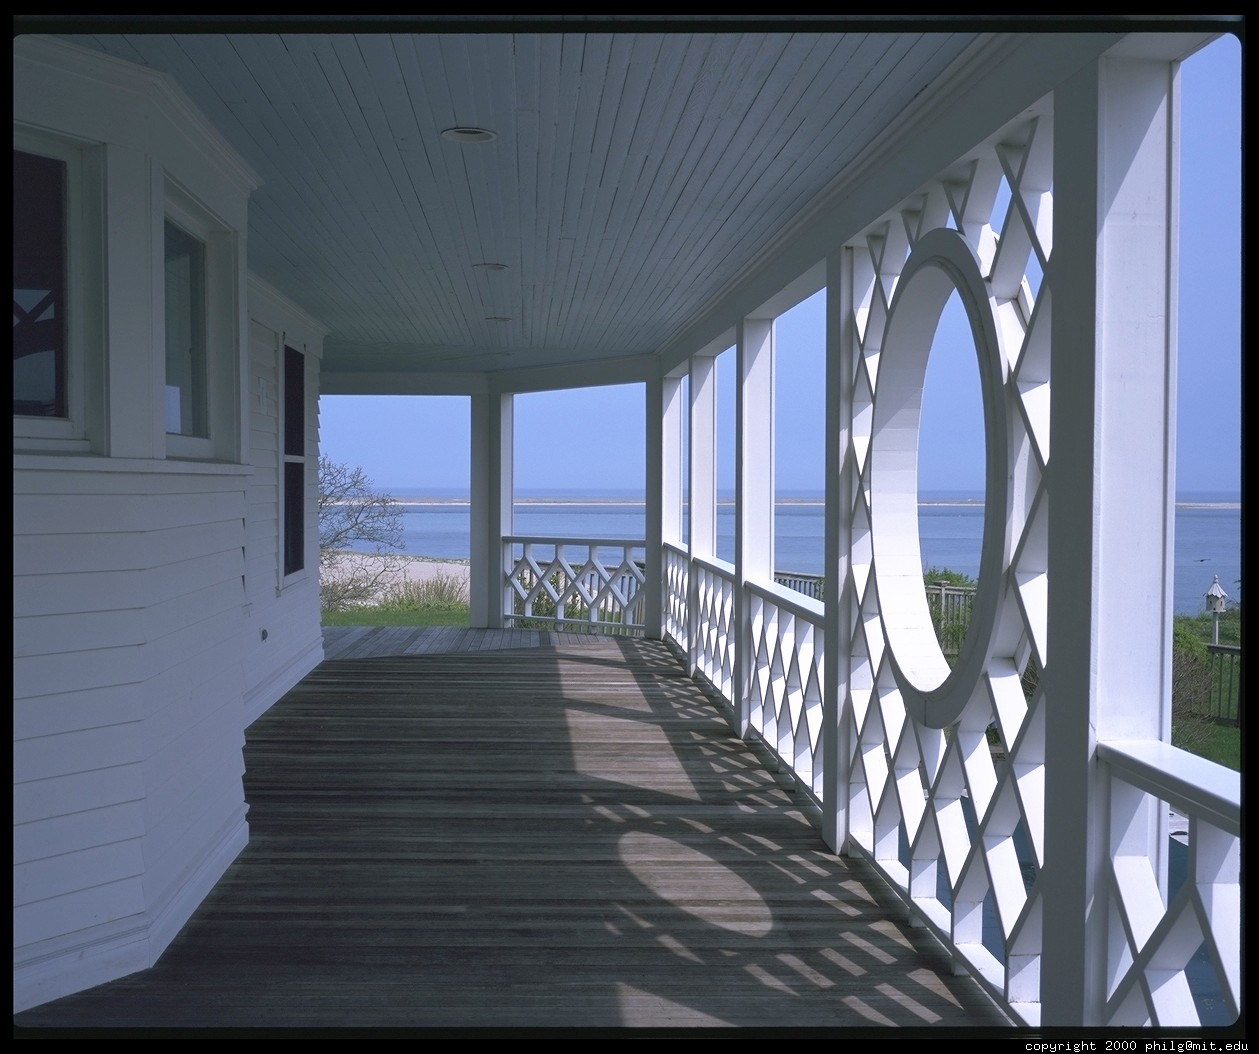 http://philip.greenspun.com/images/pcd4892/chatham-porch-17.4.jpg